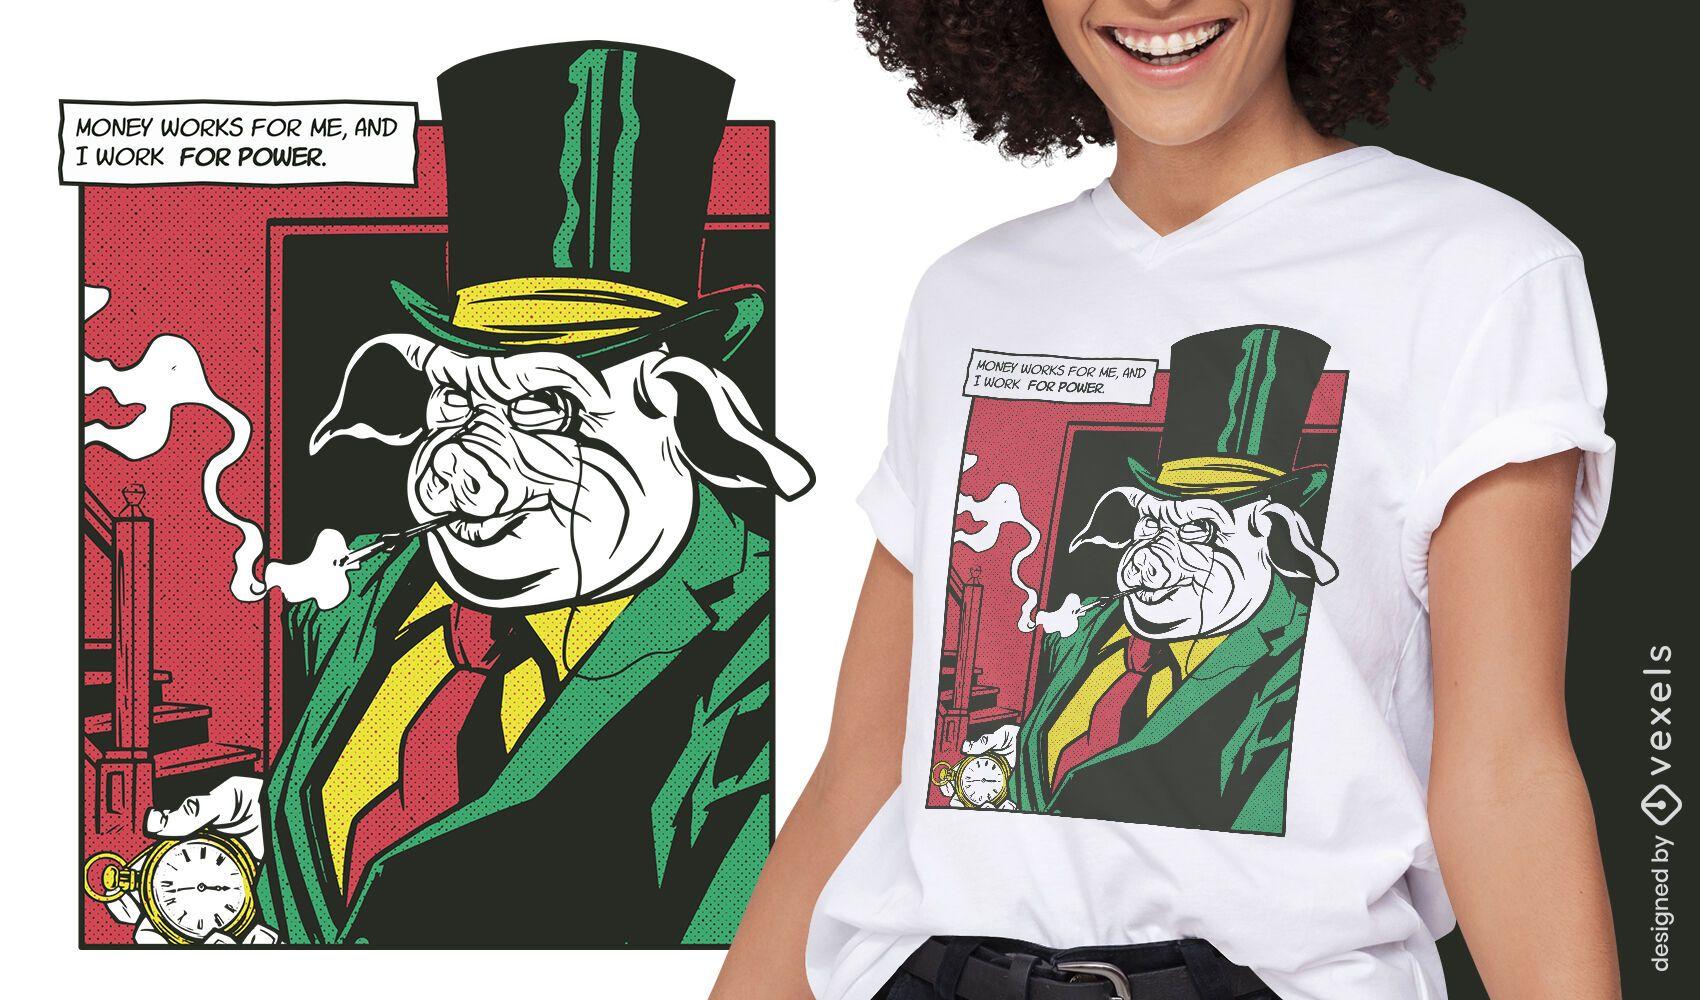 Diseño de camiseta cómica animal mafia cerdo.